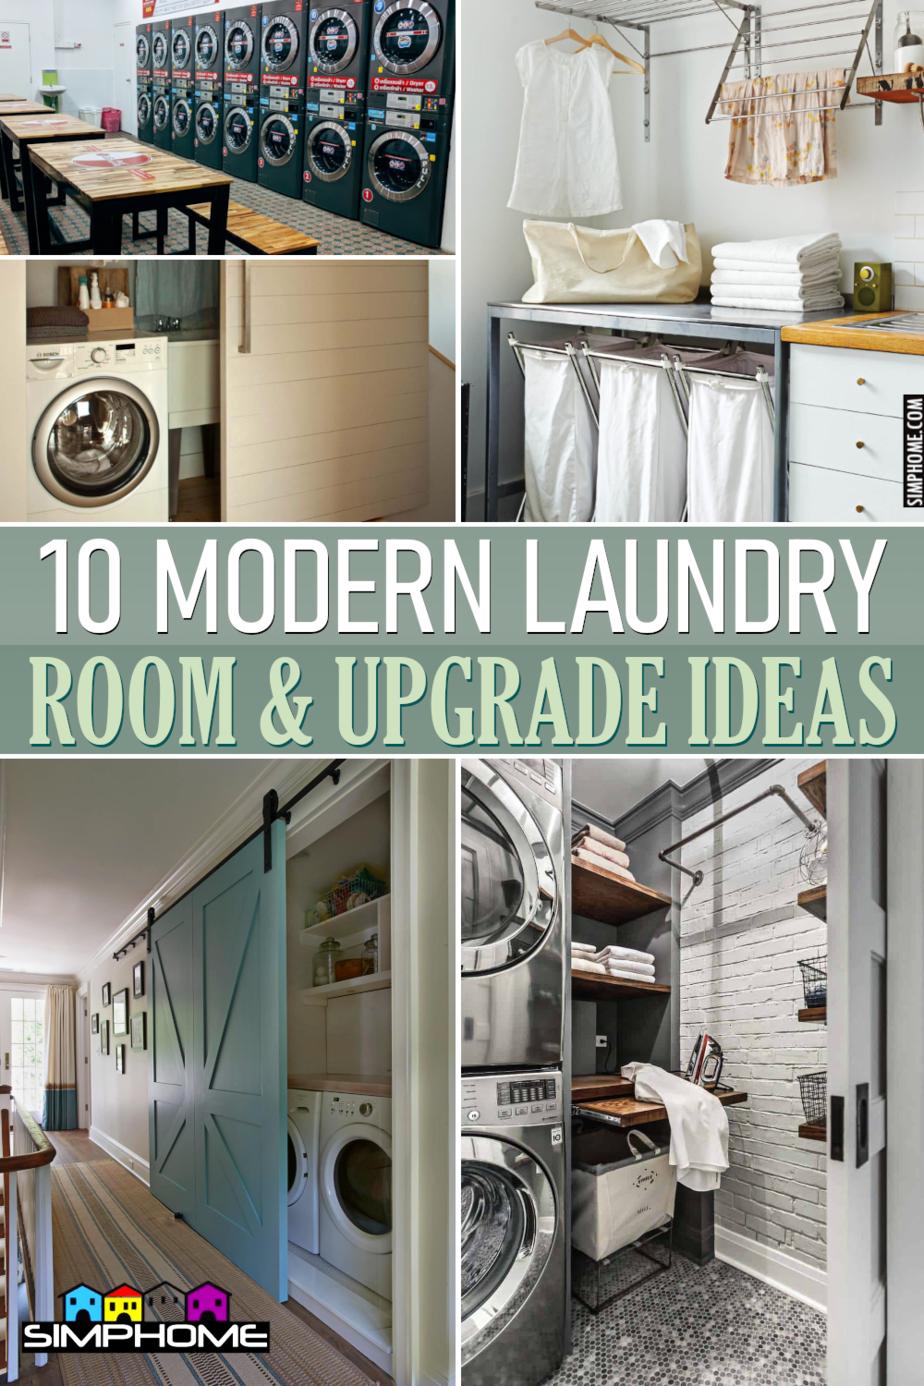 10 Modern Laundry Room Ideas via Simphome.comFeatured